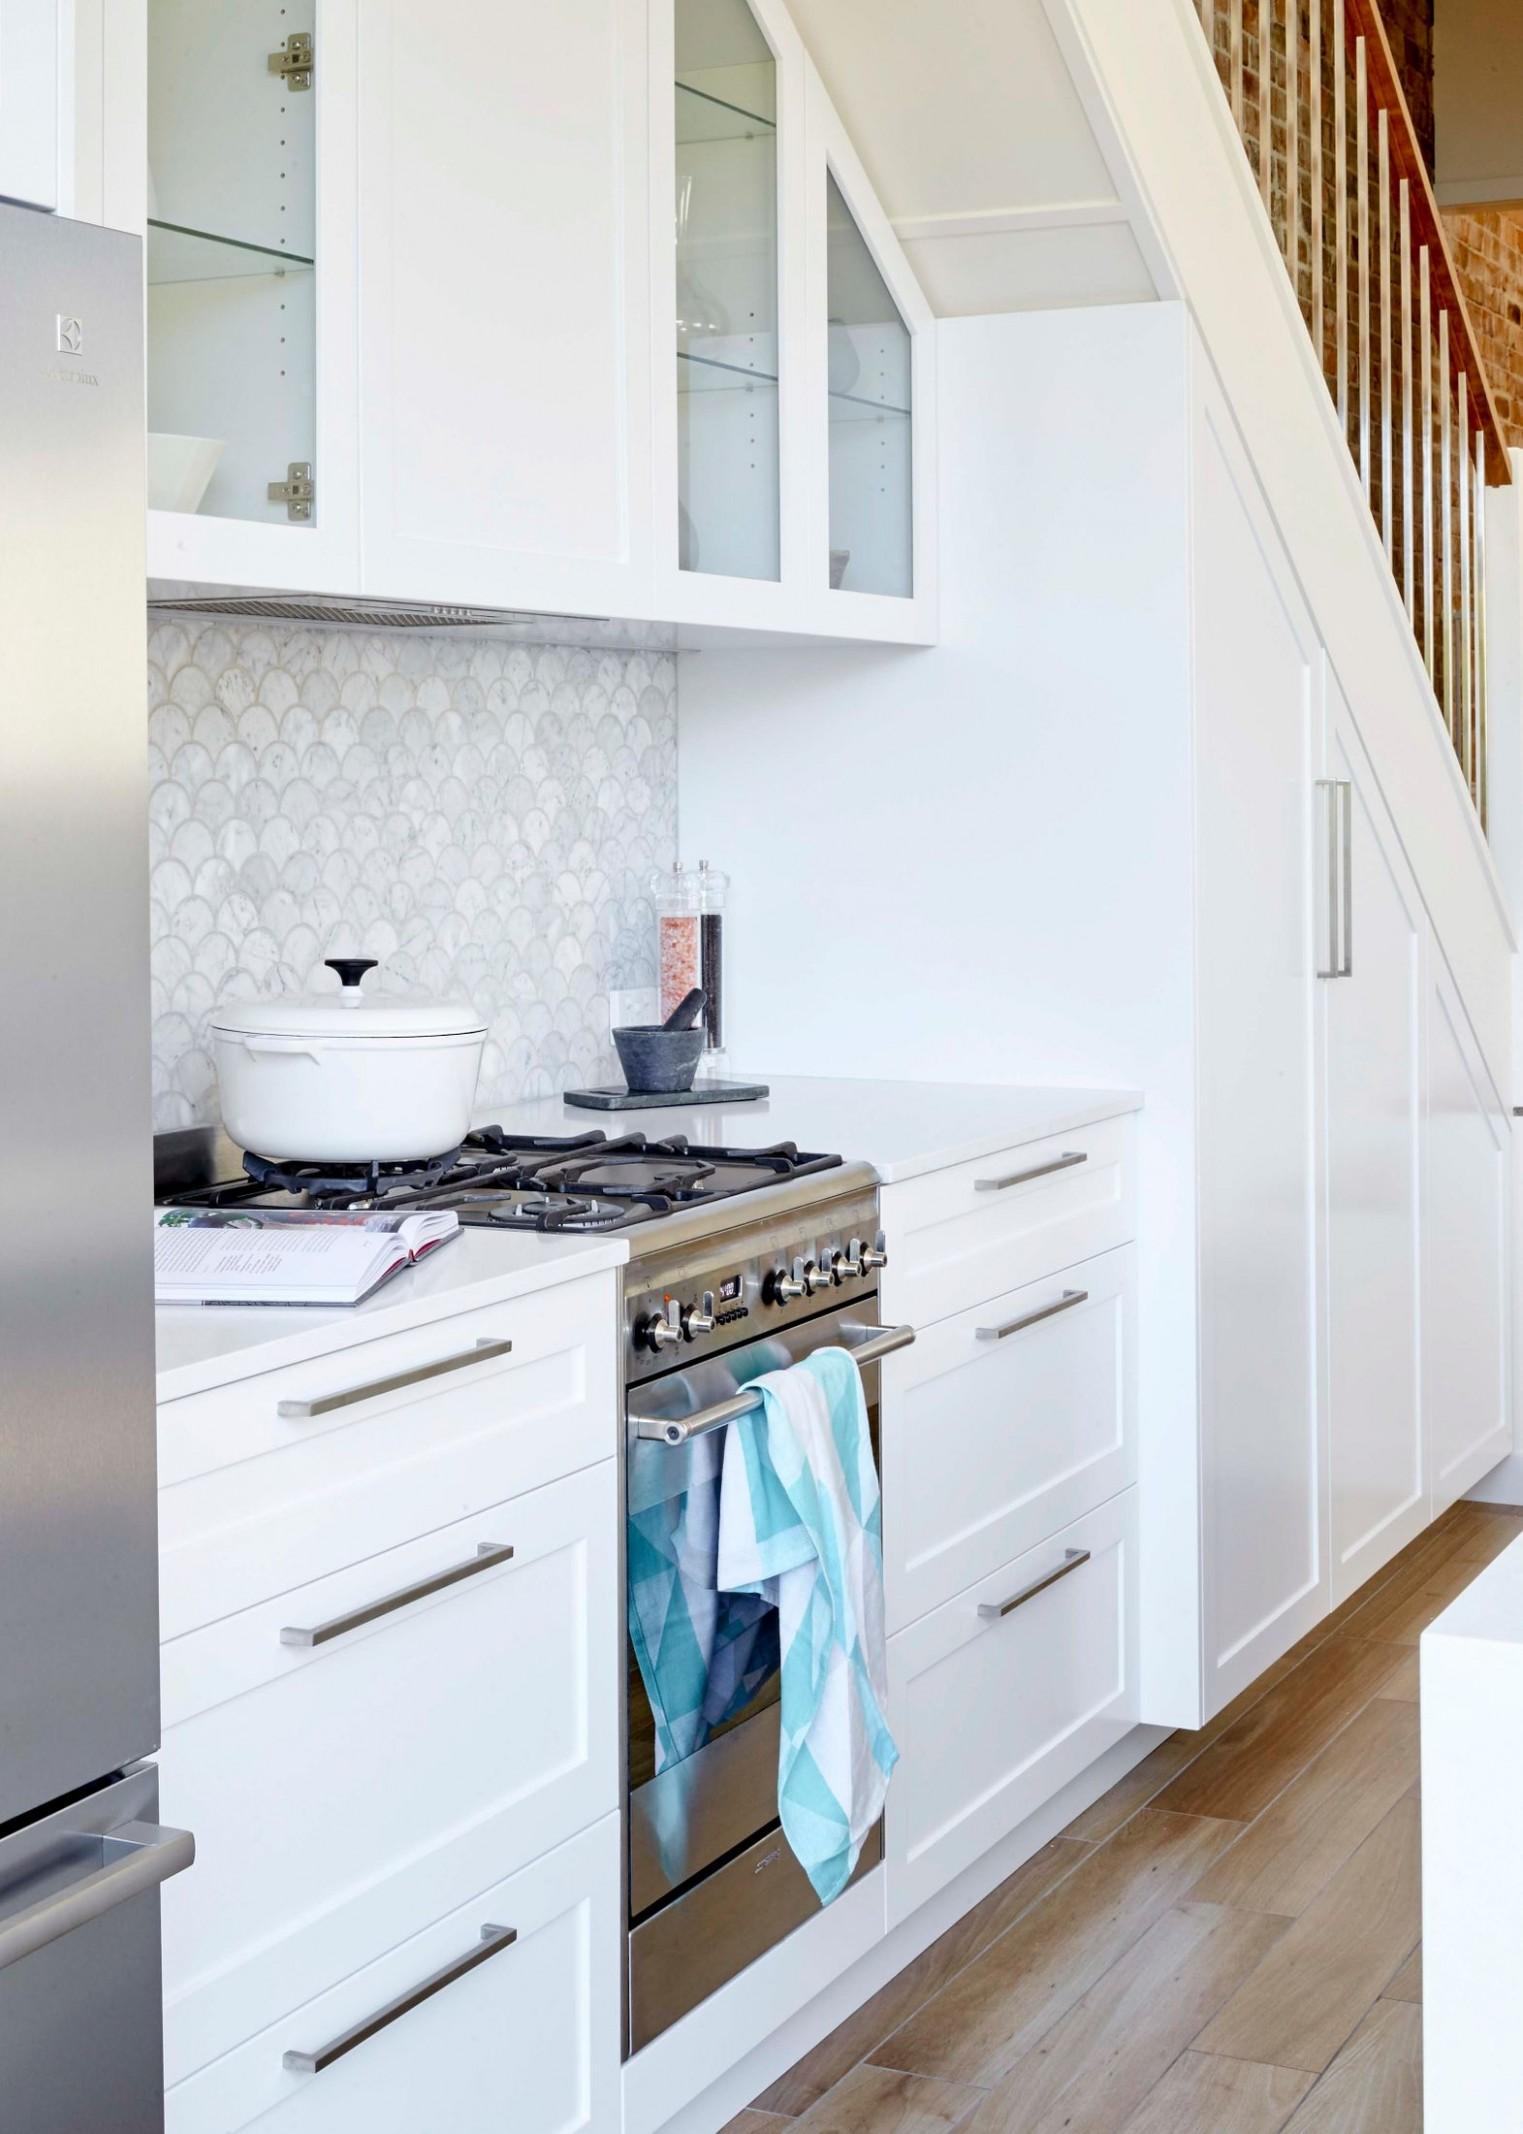 12 Small Kitchen Design Ideas  Home Beautiful Magazine Australia - Apartment Kitchen Design Sydney